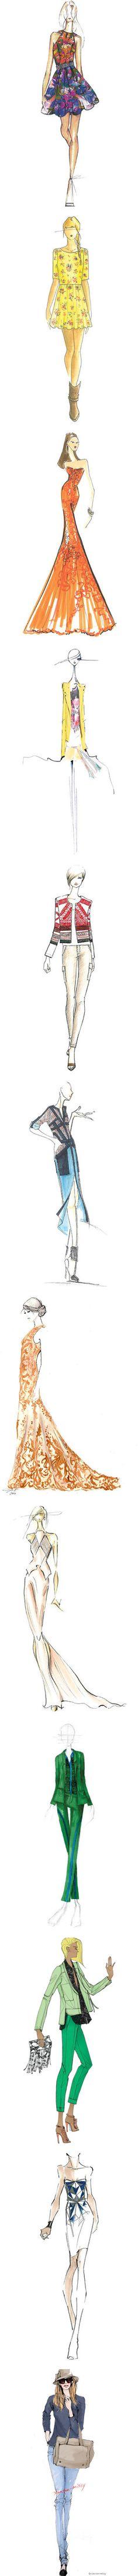 """Sketch Grils"" by mionny on Polyvore"